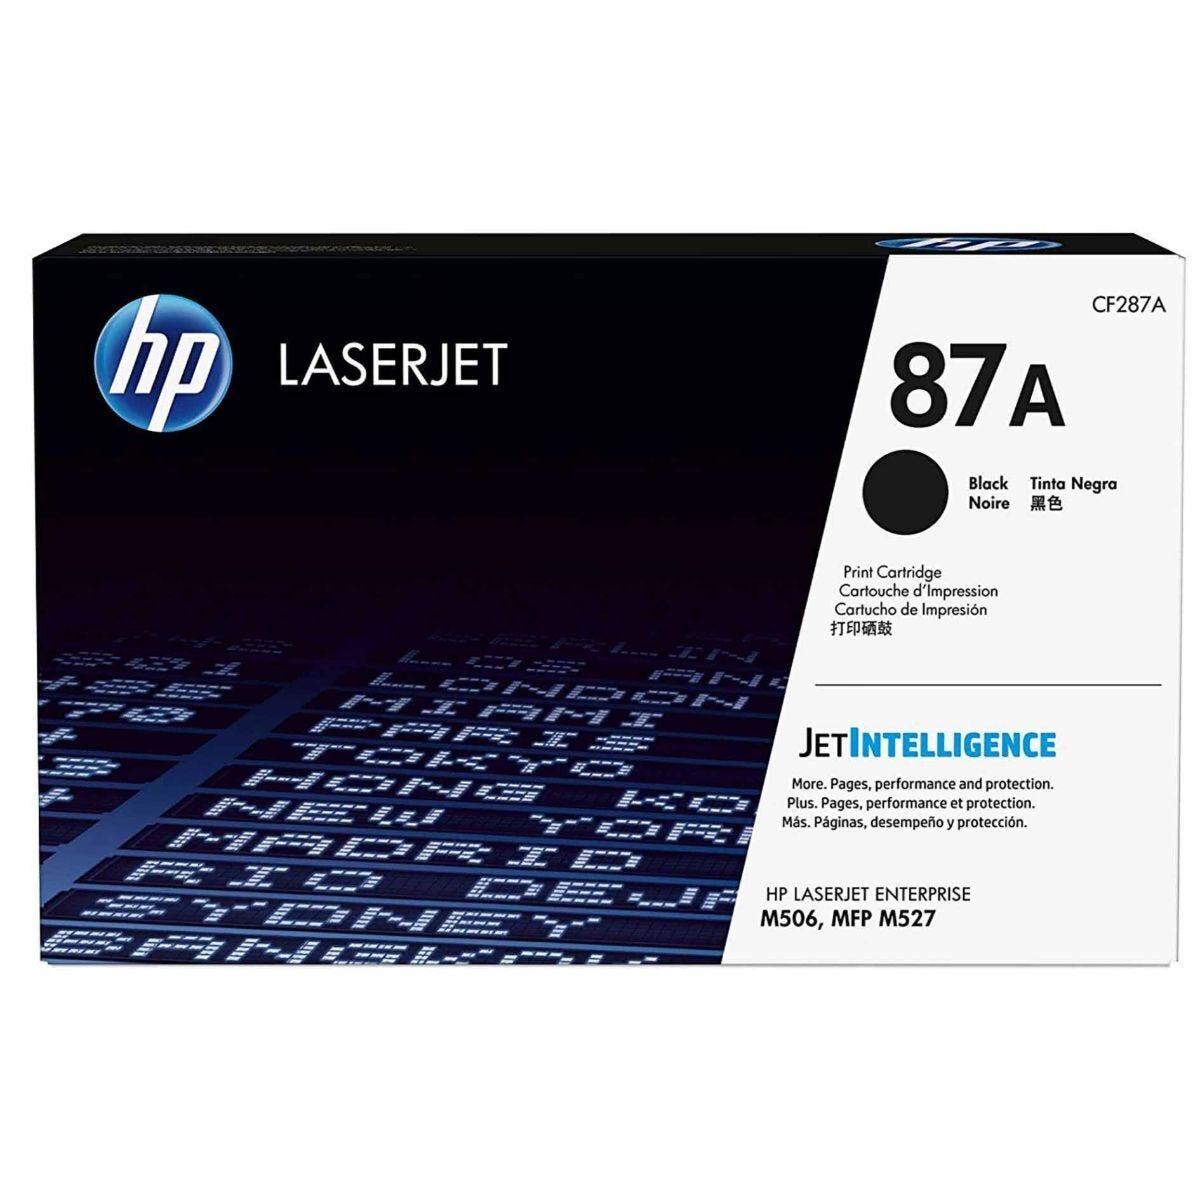 HP 87A LaserJet Toner Cartridge Black